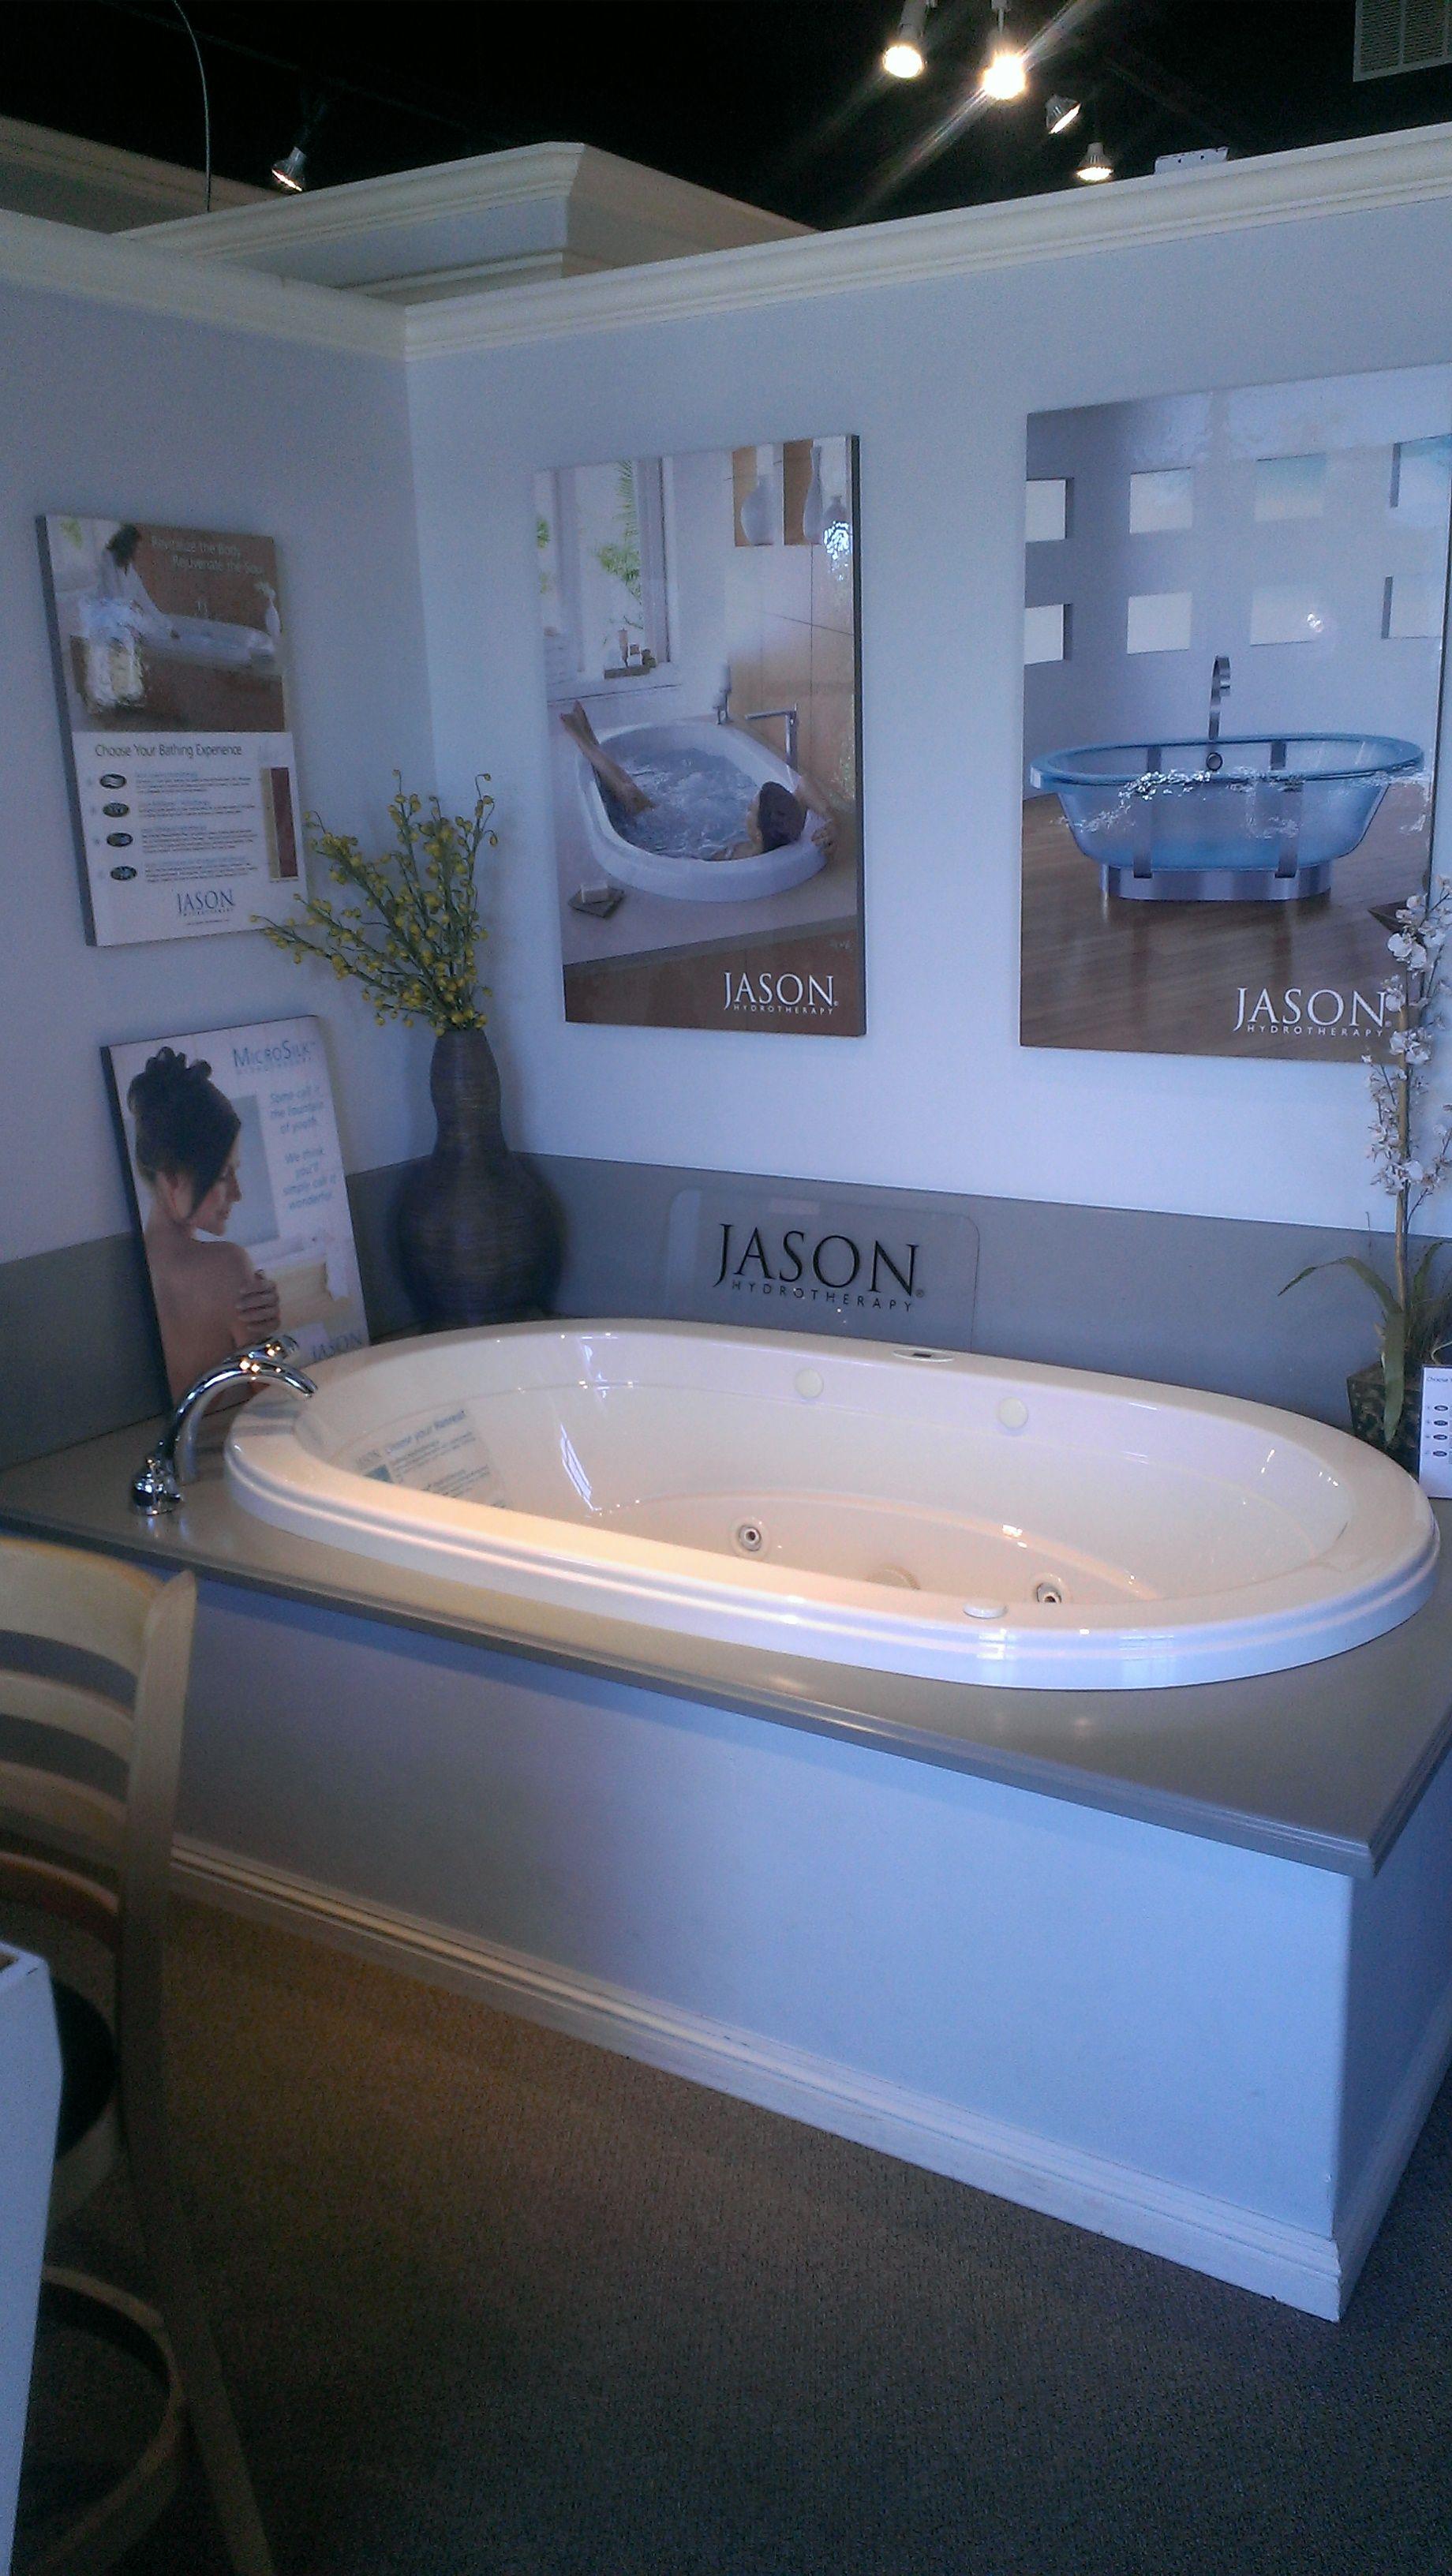 Jason International On Display For All To See Santa Cruz Kitchen Bath Kitchen Bath